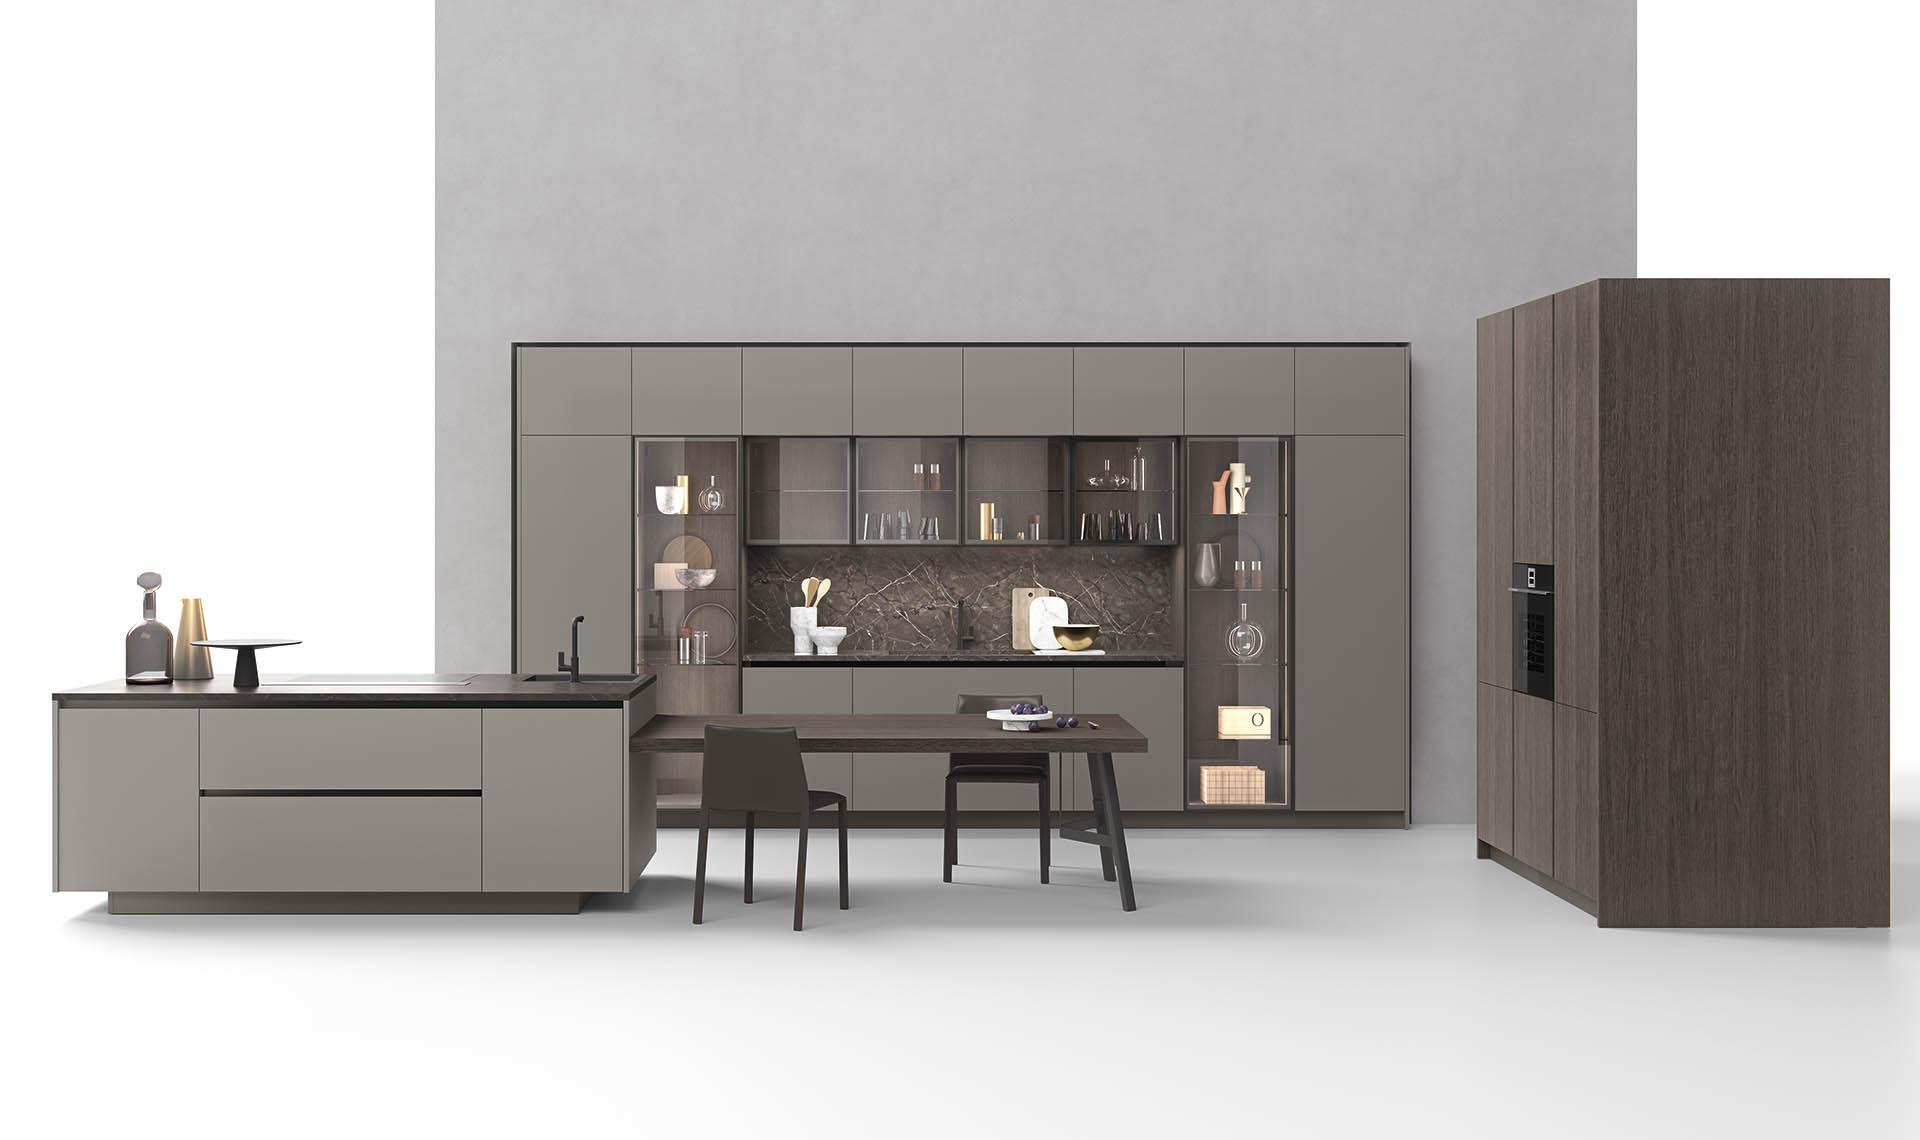 Valdesign Realizza Cucine Moderne Cucine Moderne Di Alta Qualita Per La Tua Casa